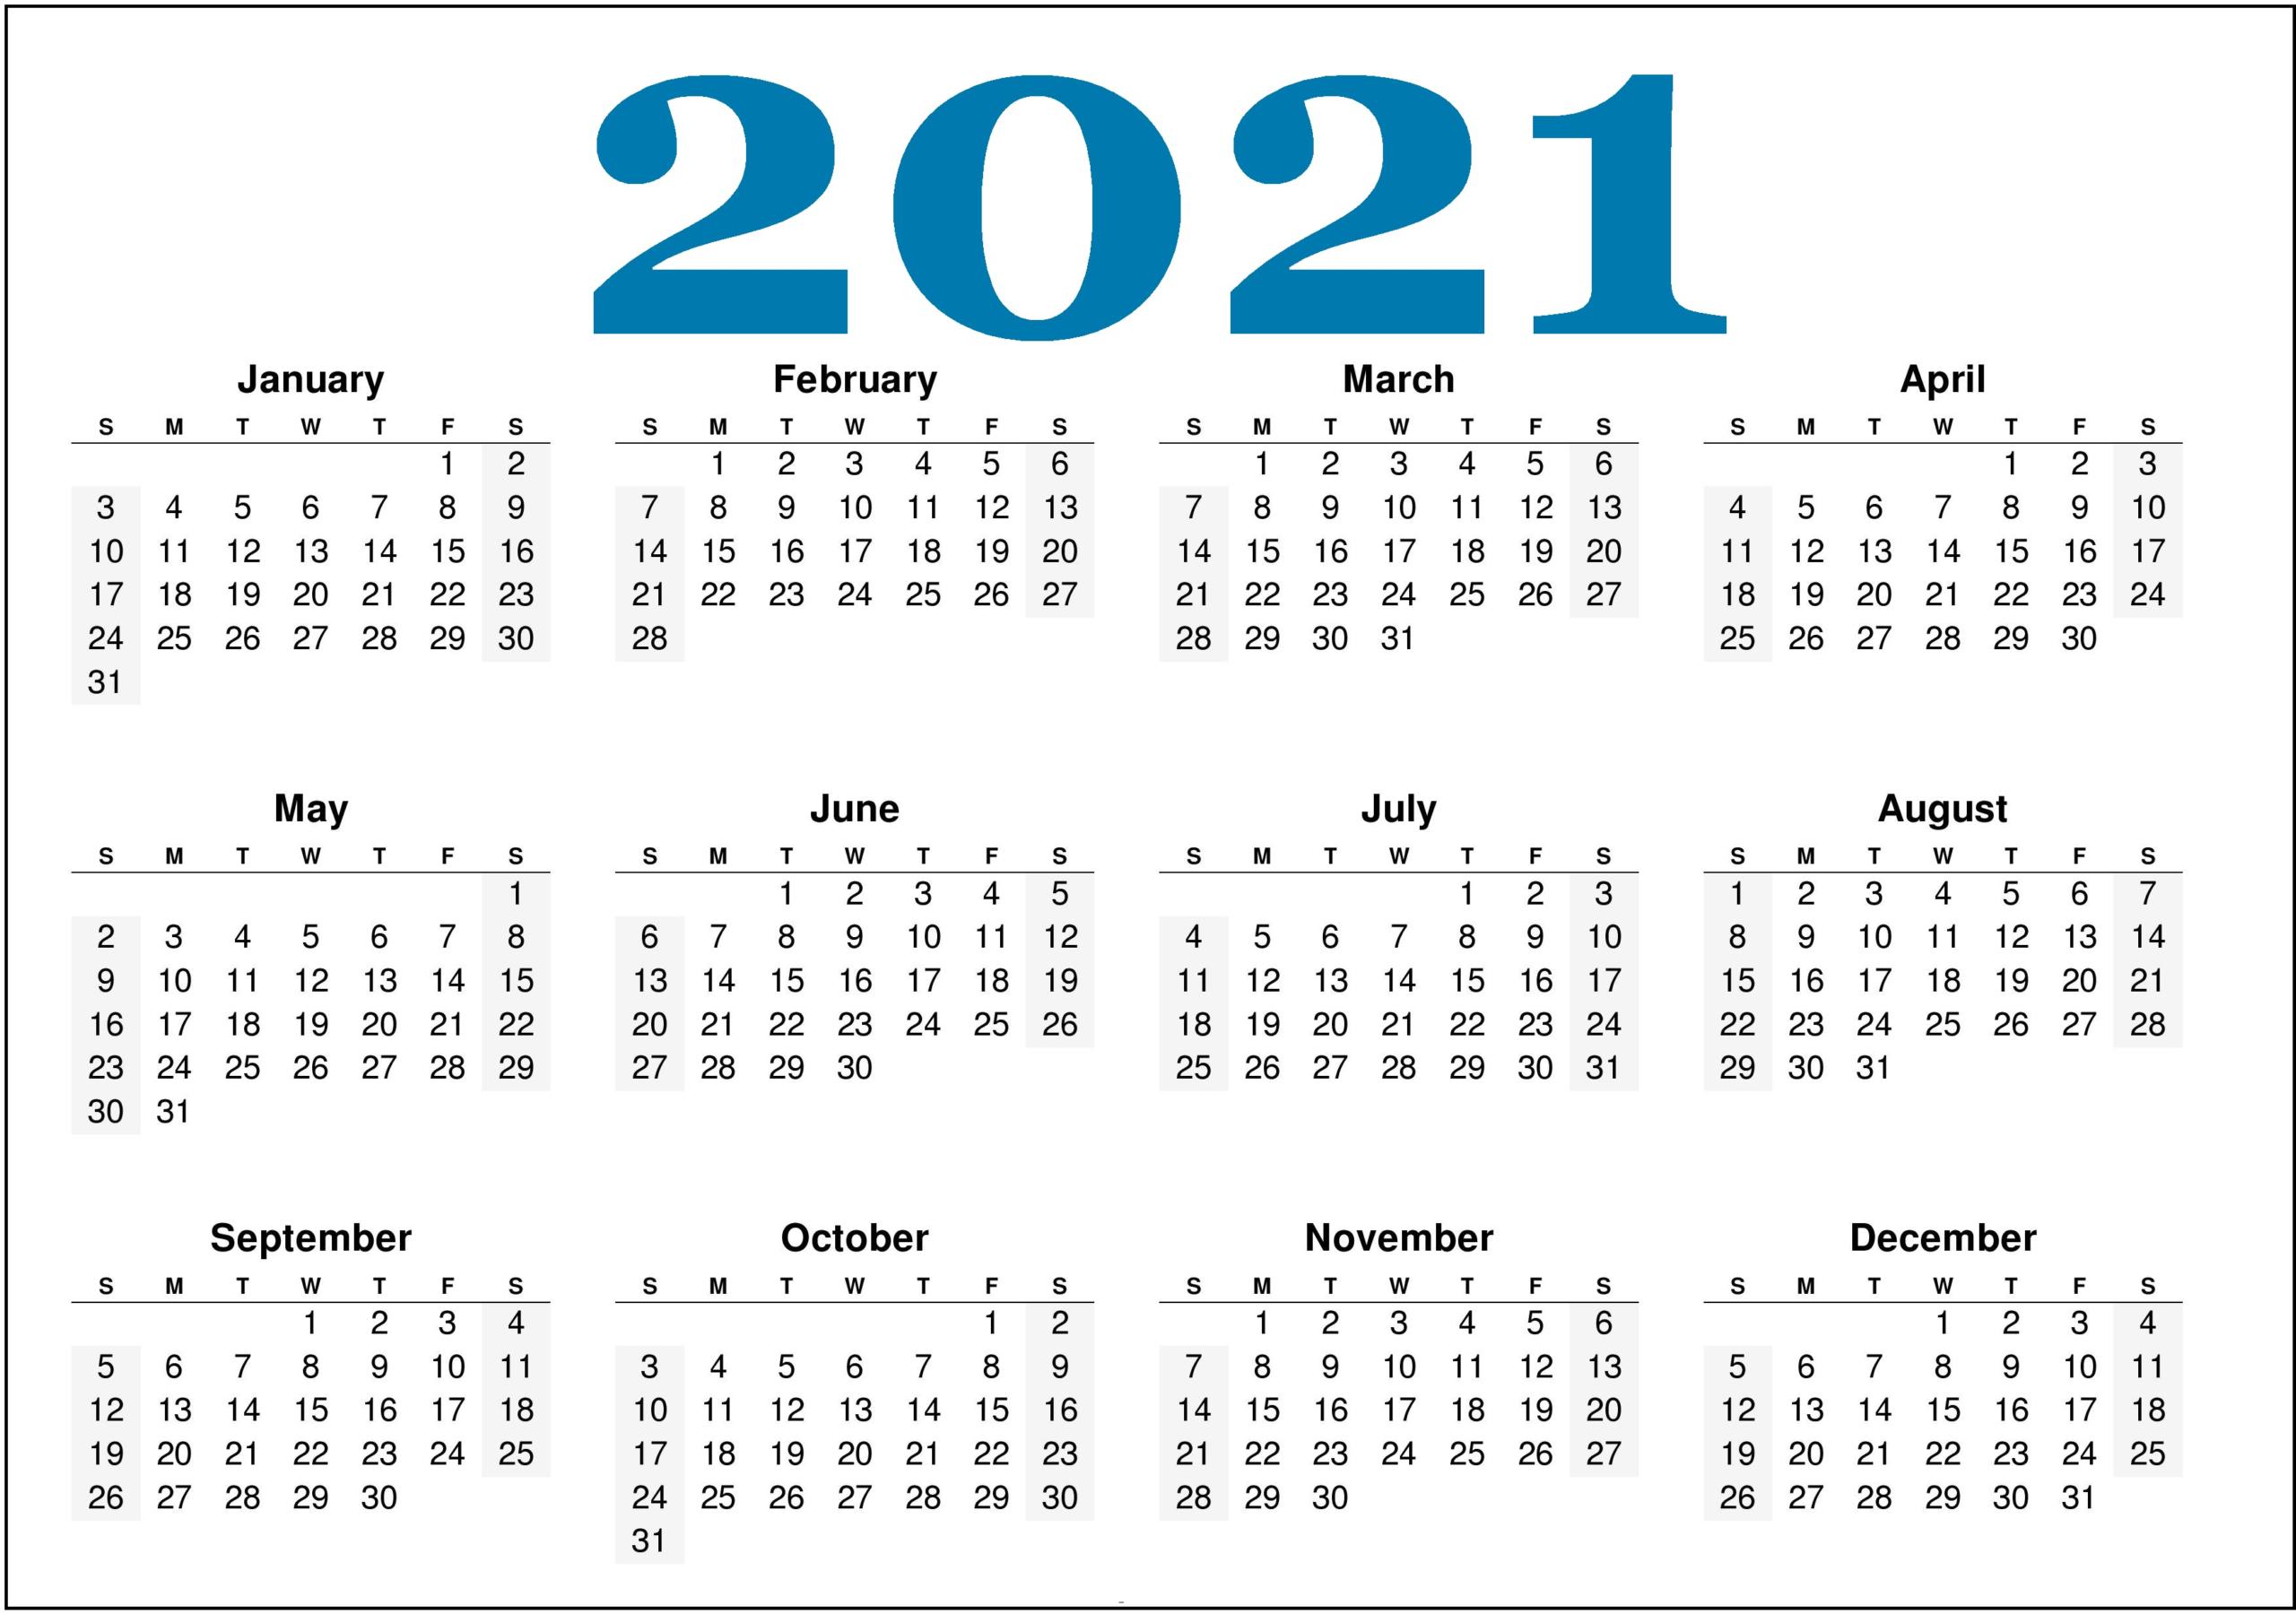 2021 Calendar Printable With Holidays  Printable Calendar inside Important Awarness Dates 2021 Australia